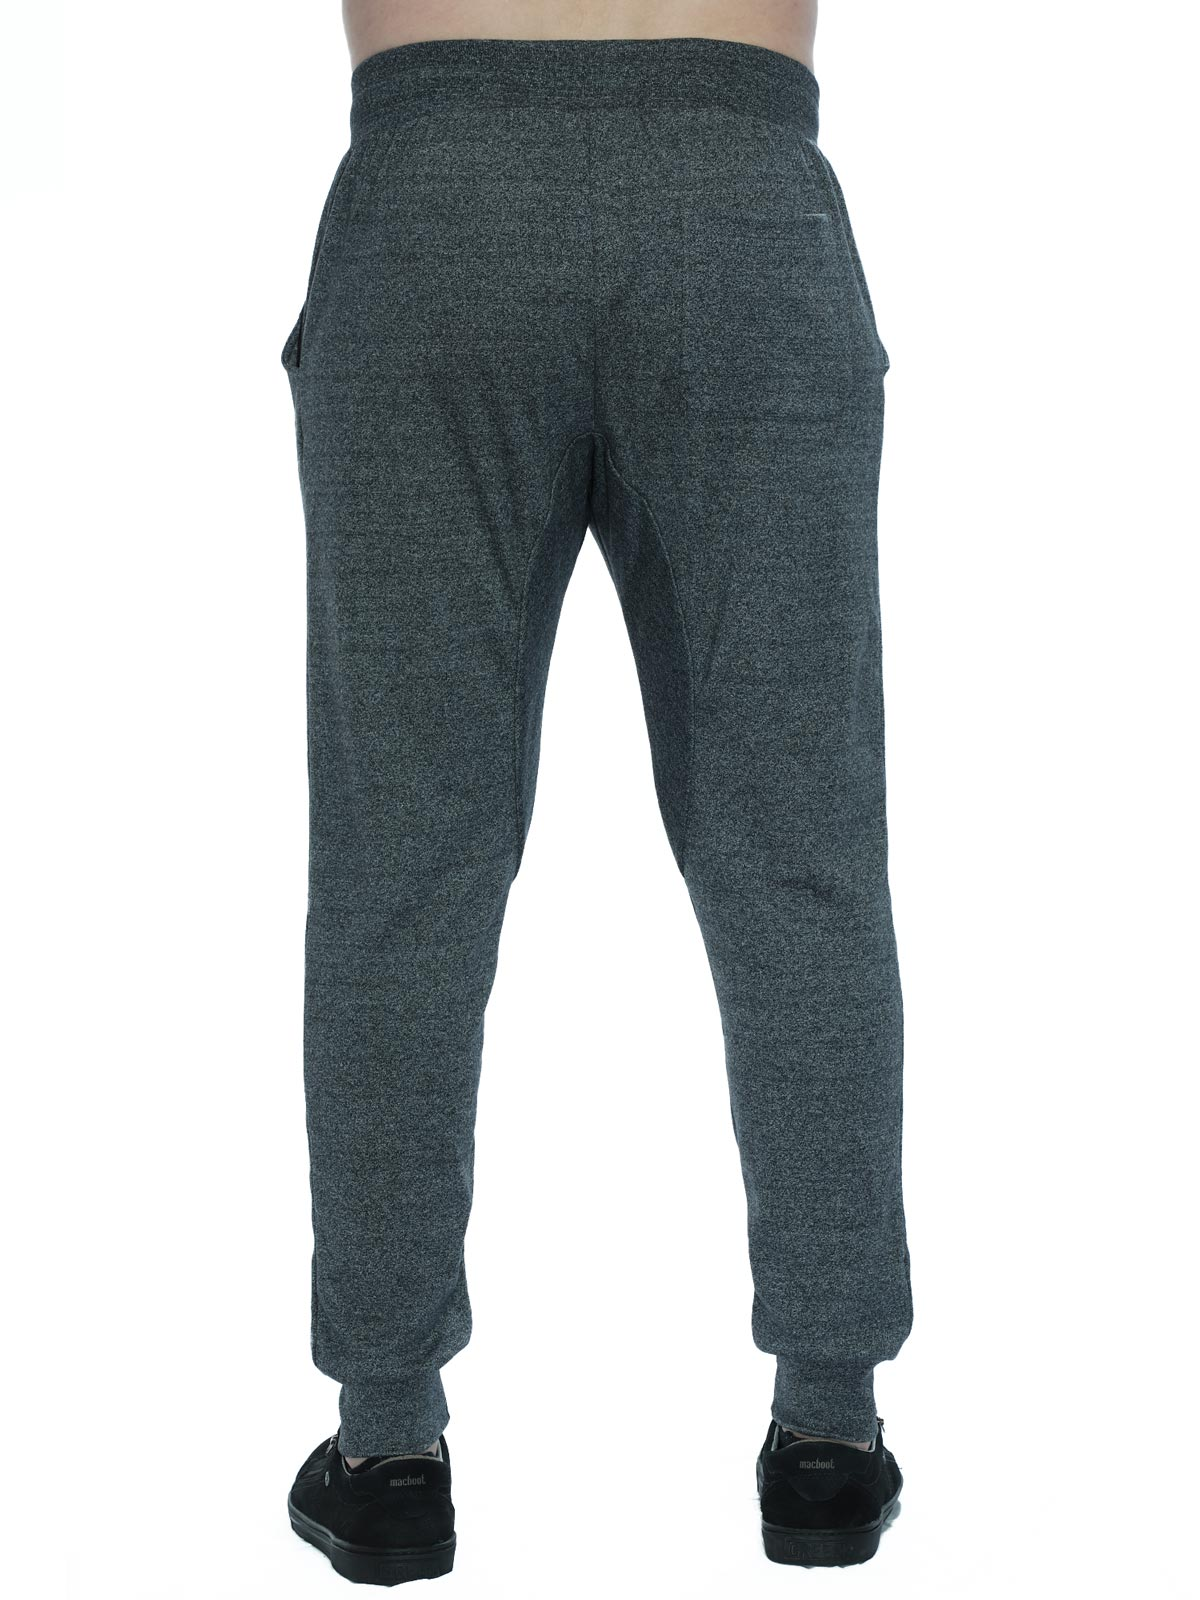 Calça Masculina Jogger Suedine Anistia Mescla Escuro